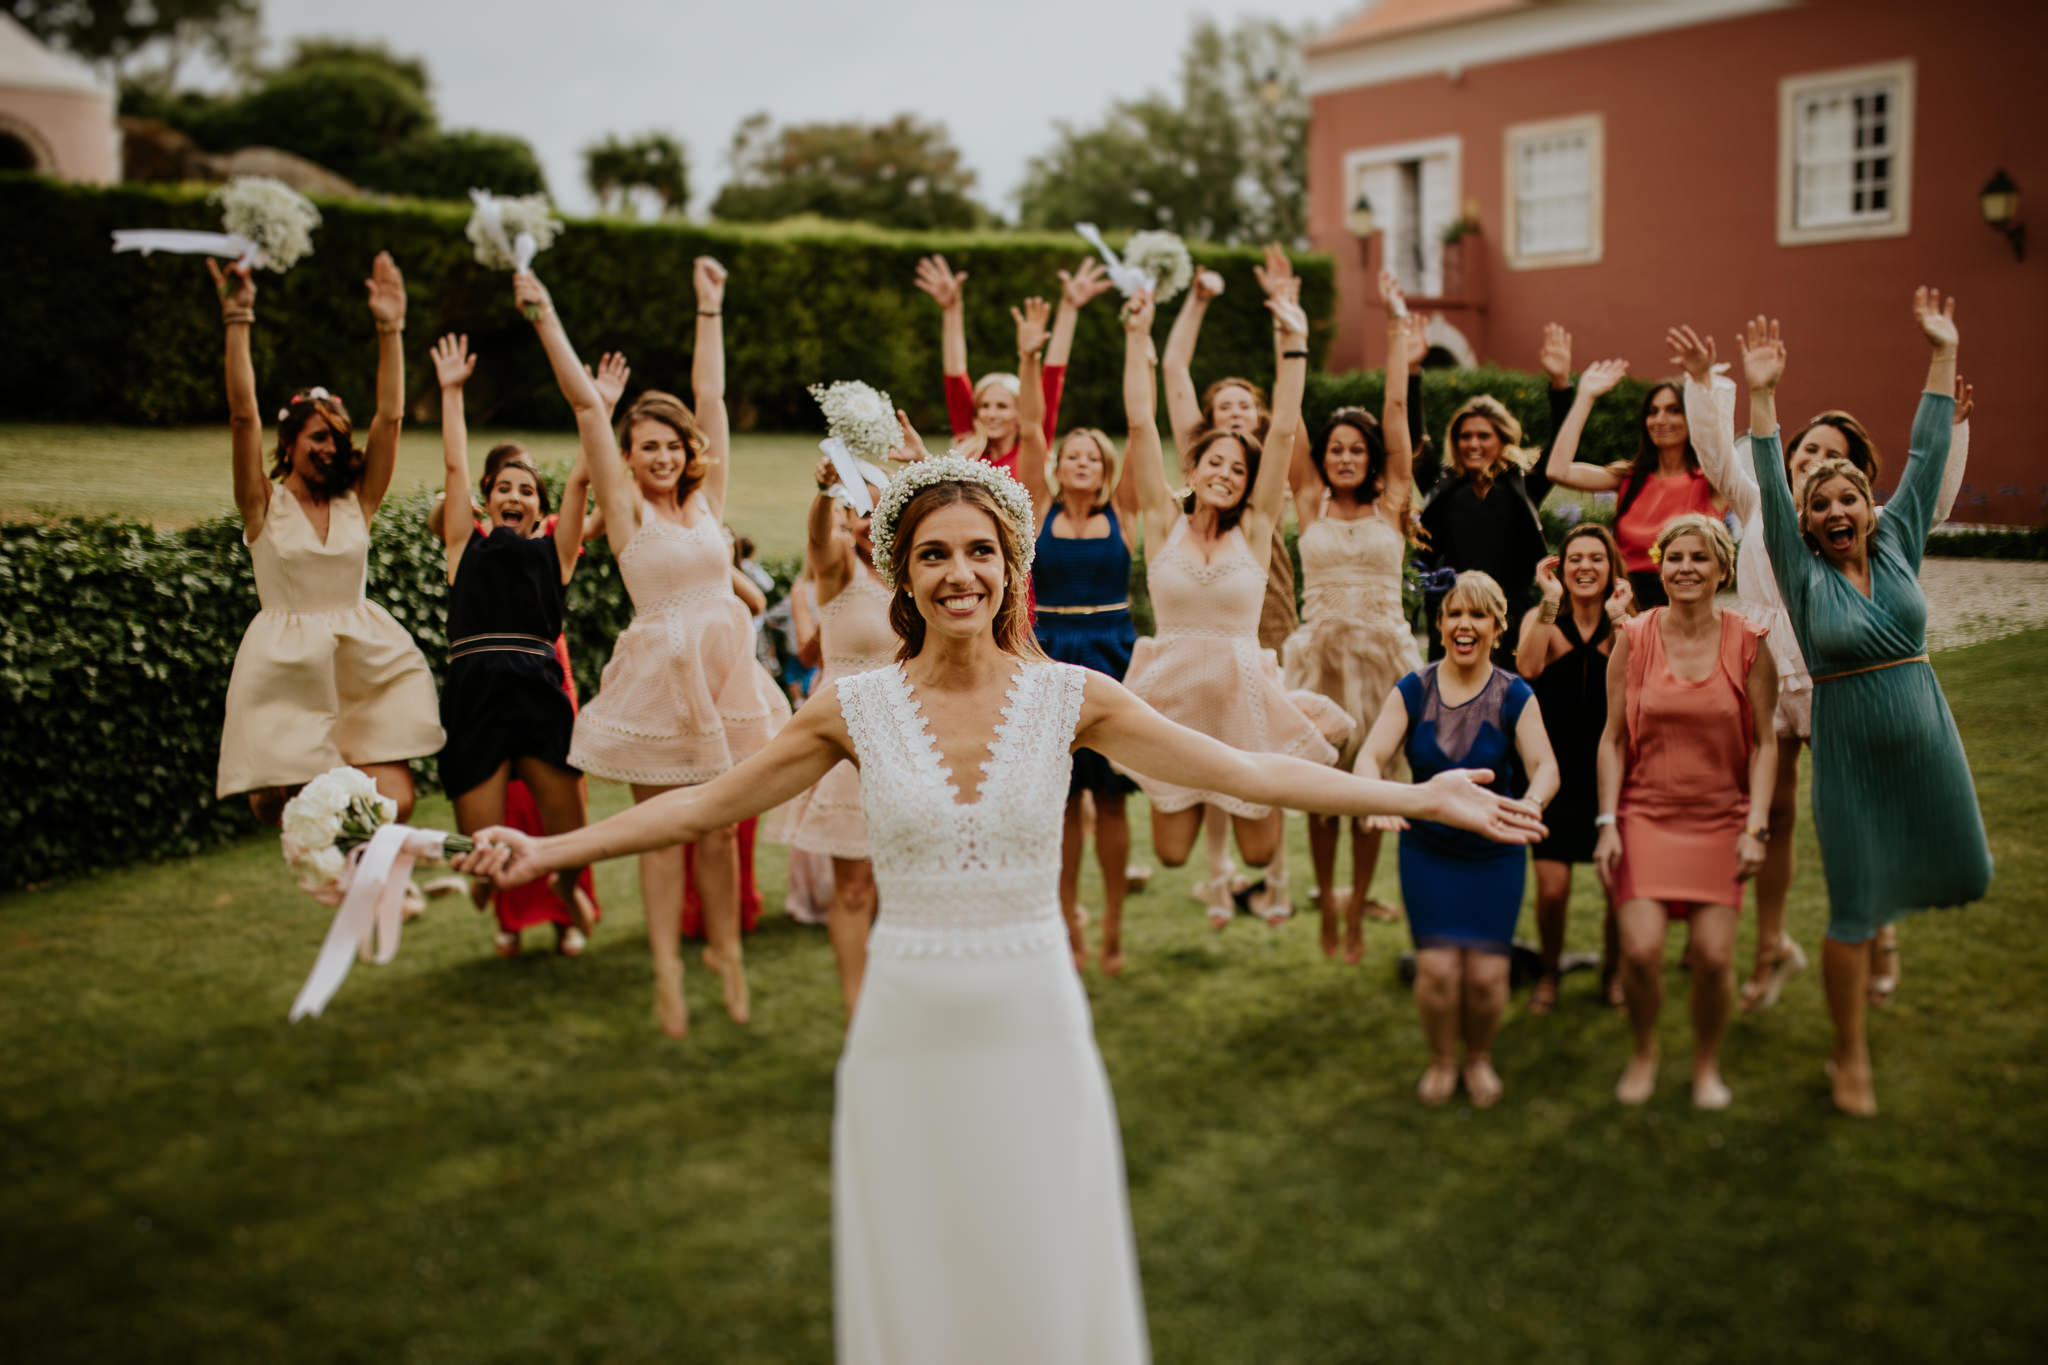 romina_thomas_destination_wedding_photography_fotografia_de_casamento_lisbon_sintra_penha_longa_resort-63